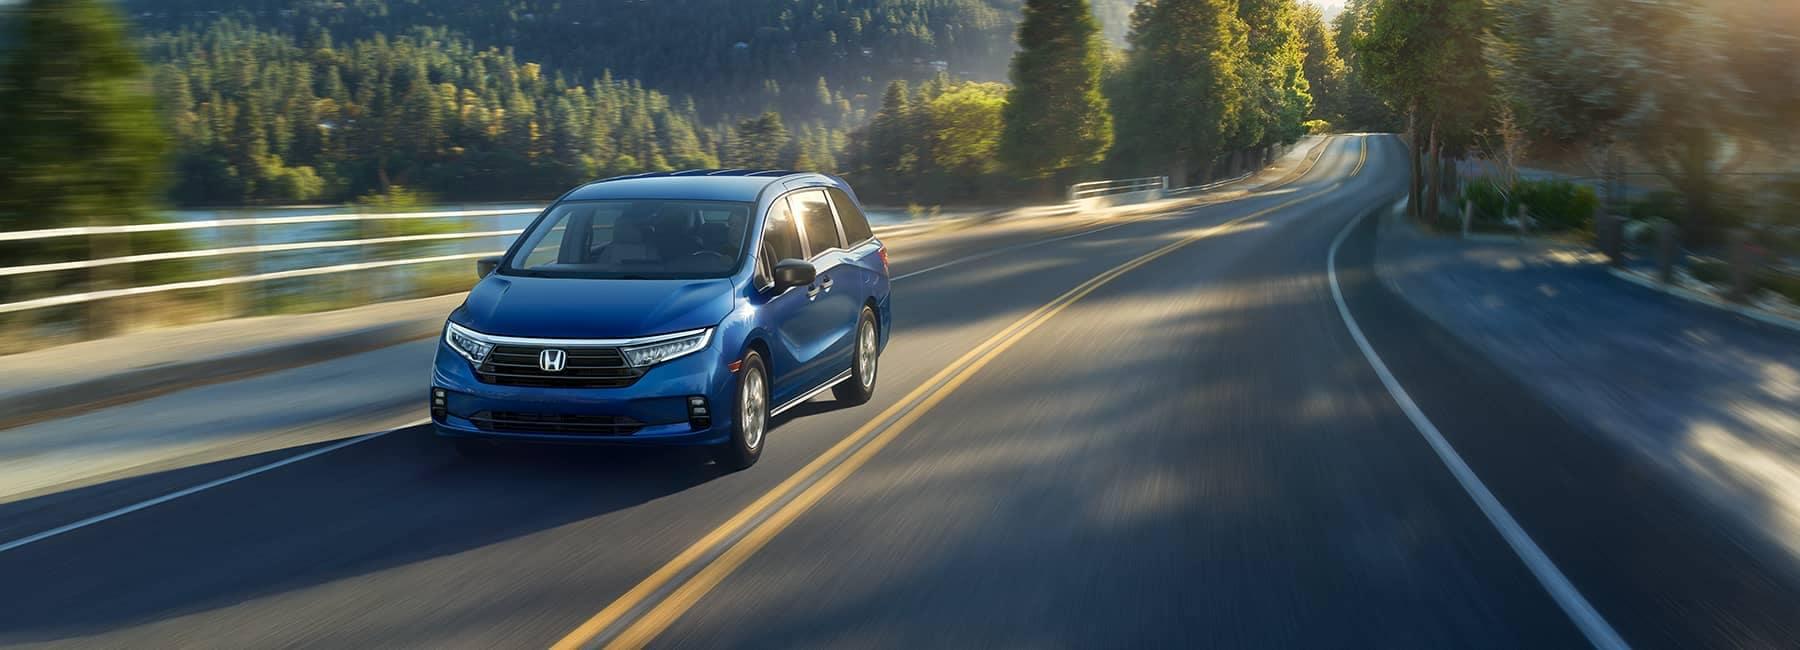 2021 Sapphire Blue Honda Odyssey driving along a mountain road